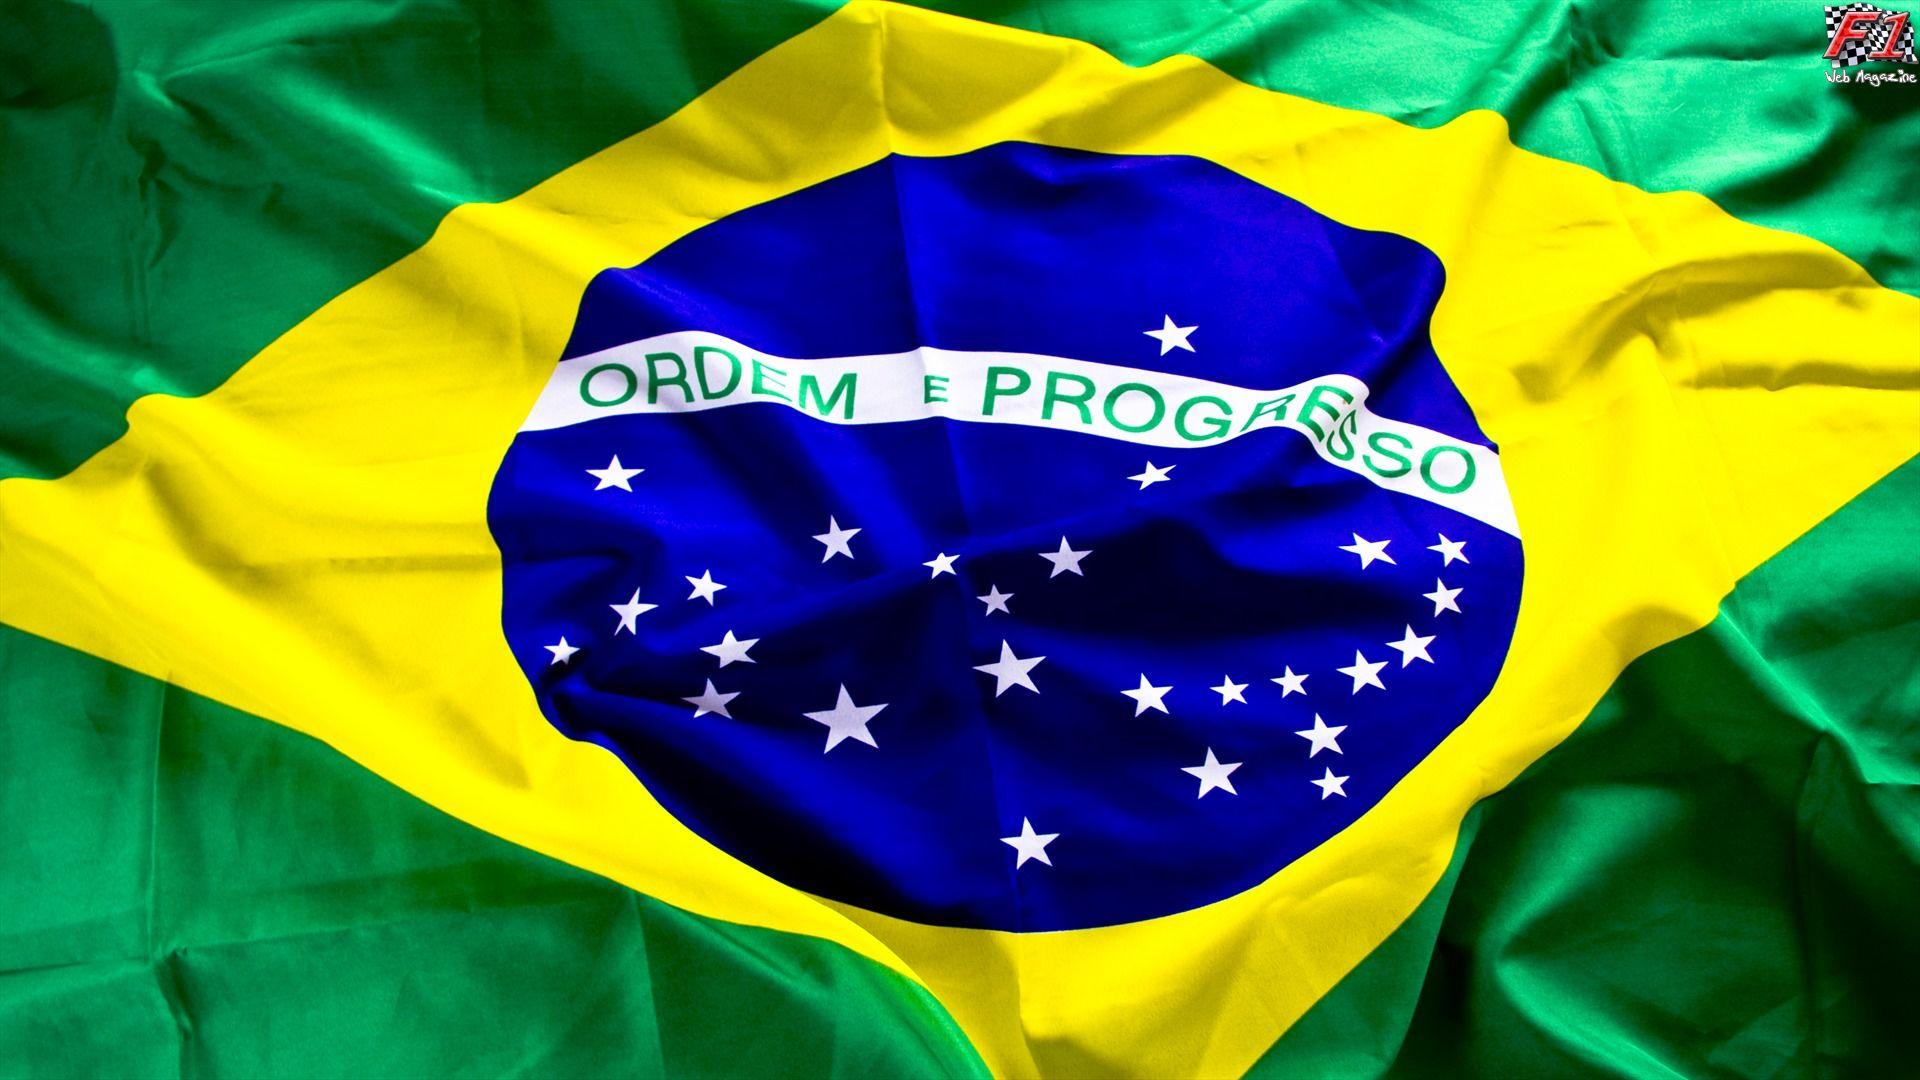 Gp Brasile - Live! - Diretta